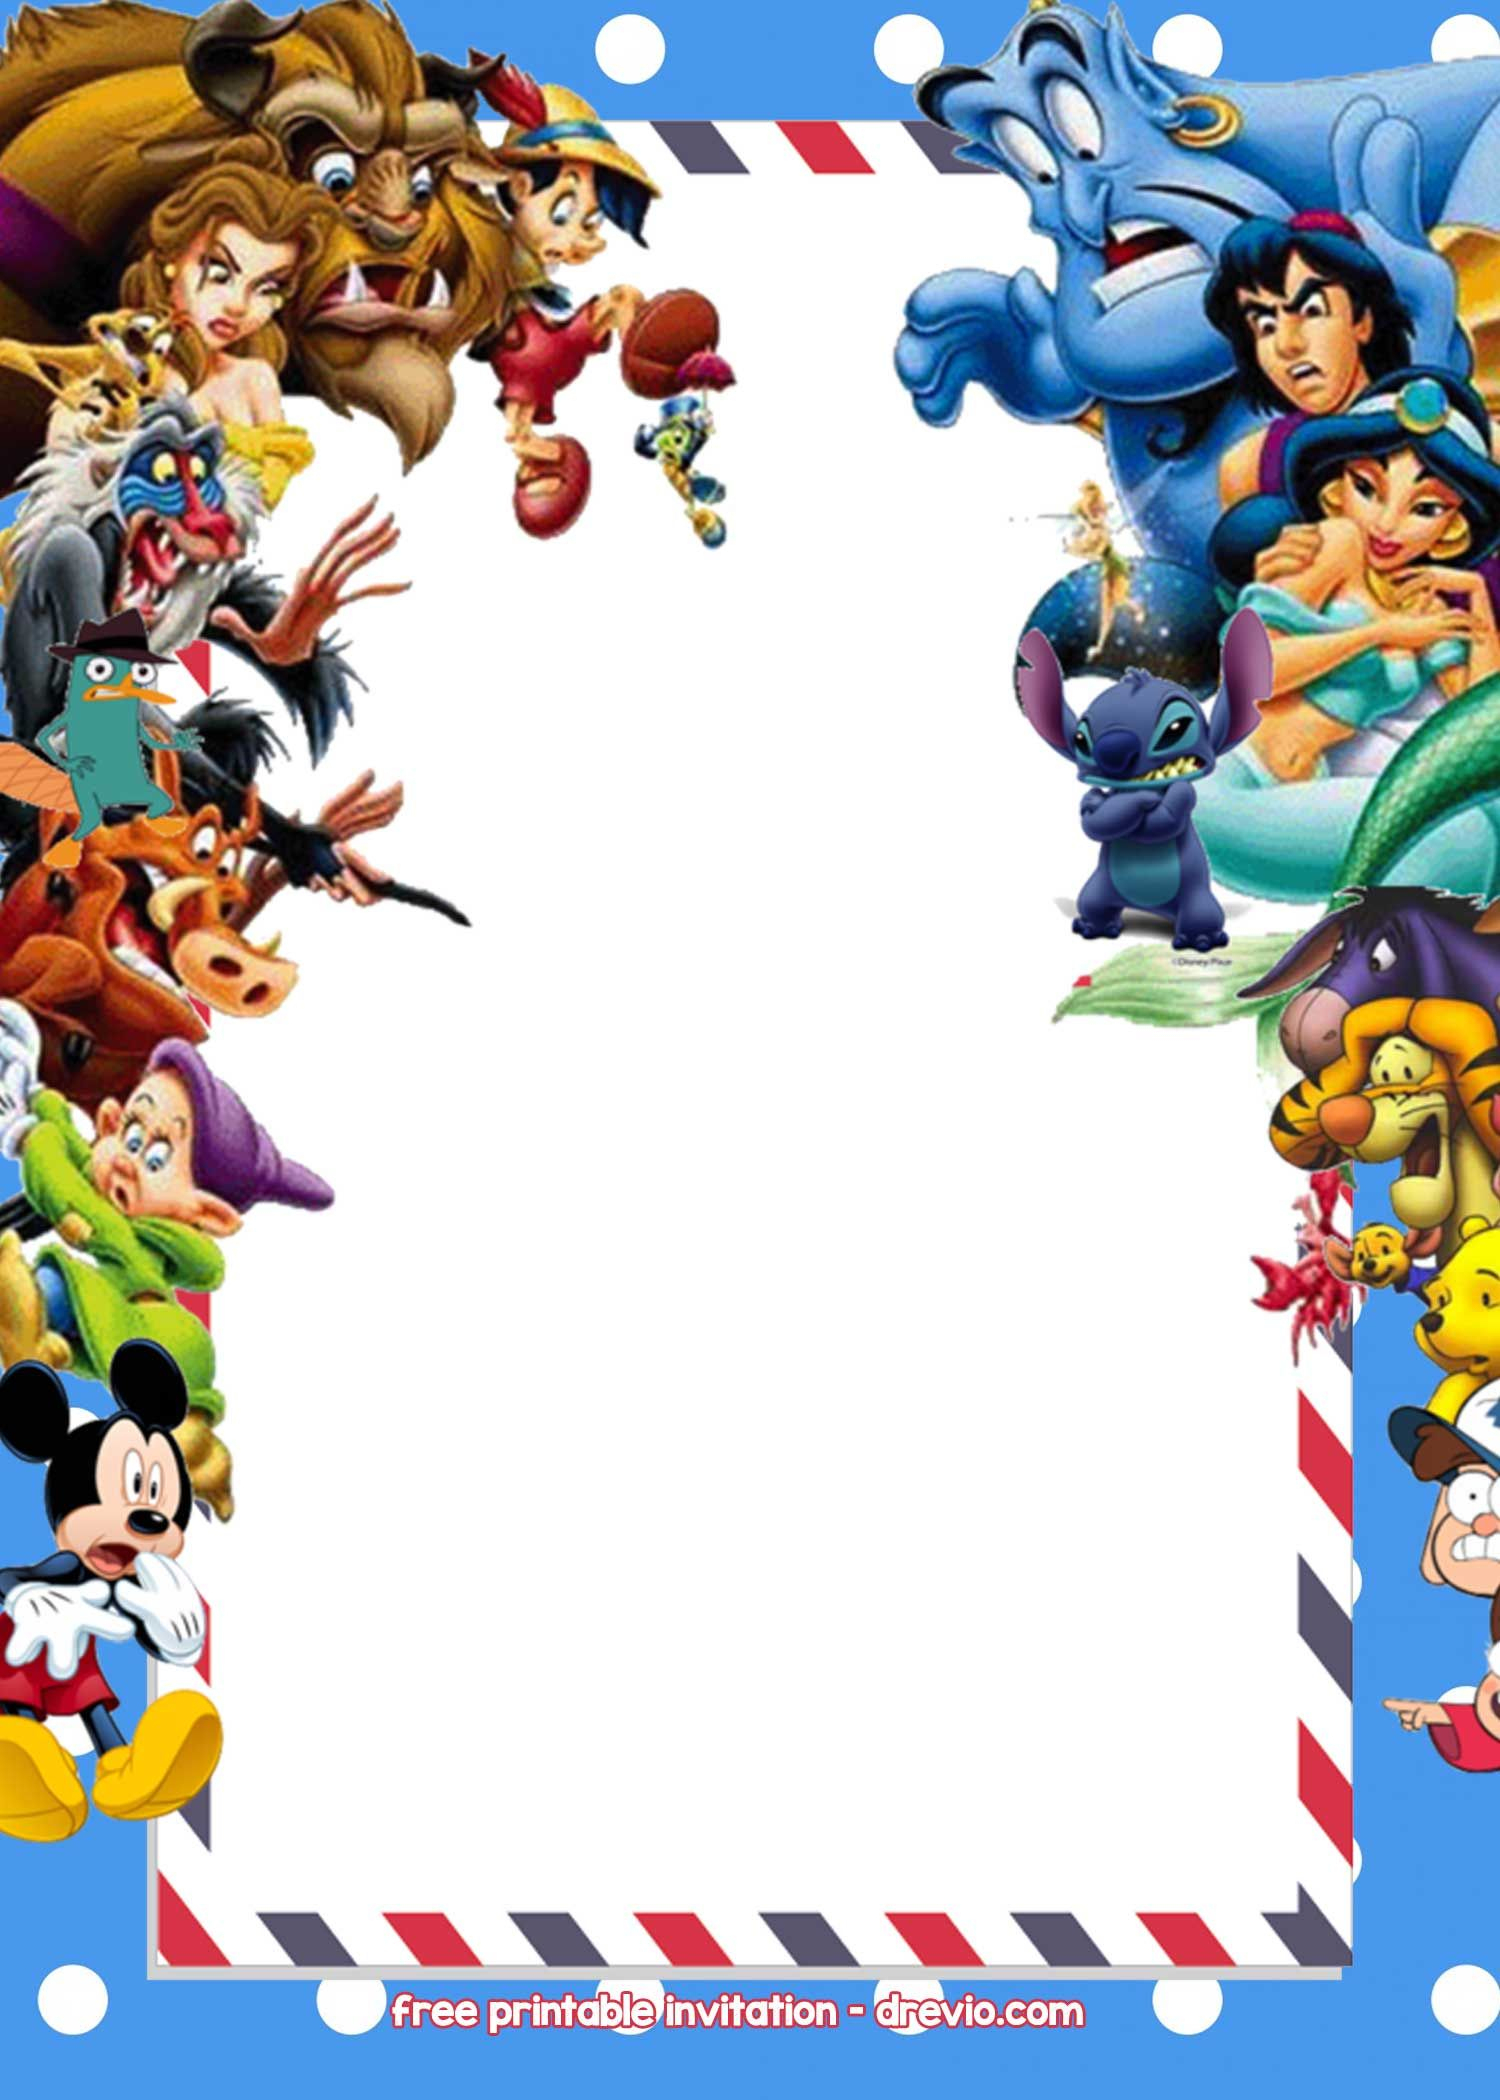 Free Disney Invitations Templates   Free Printable Birthday - Free Printable Disney Invitations